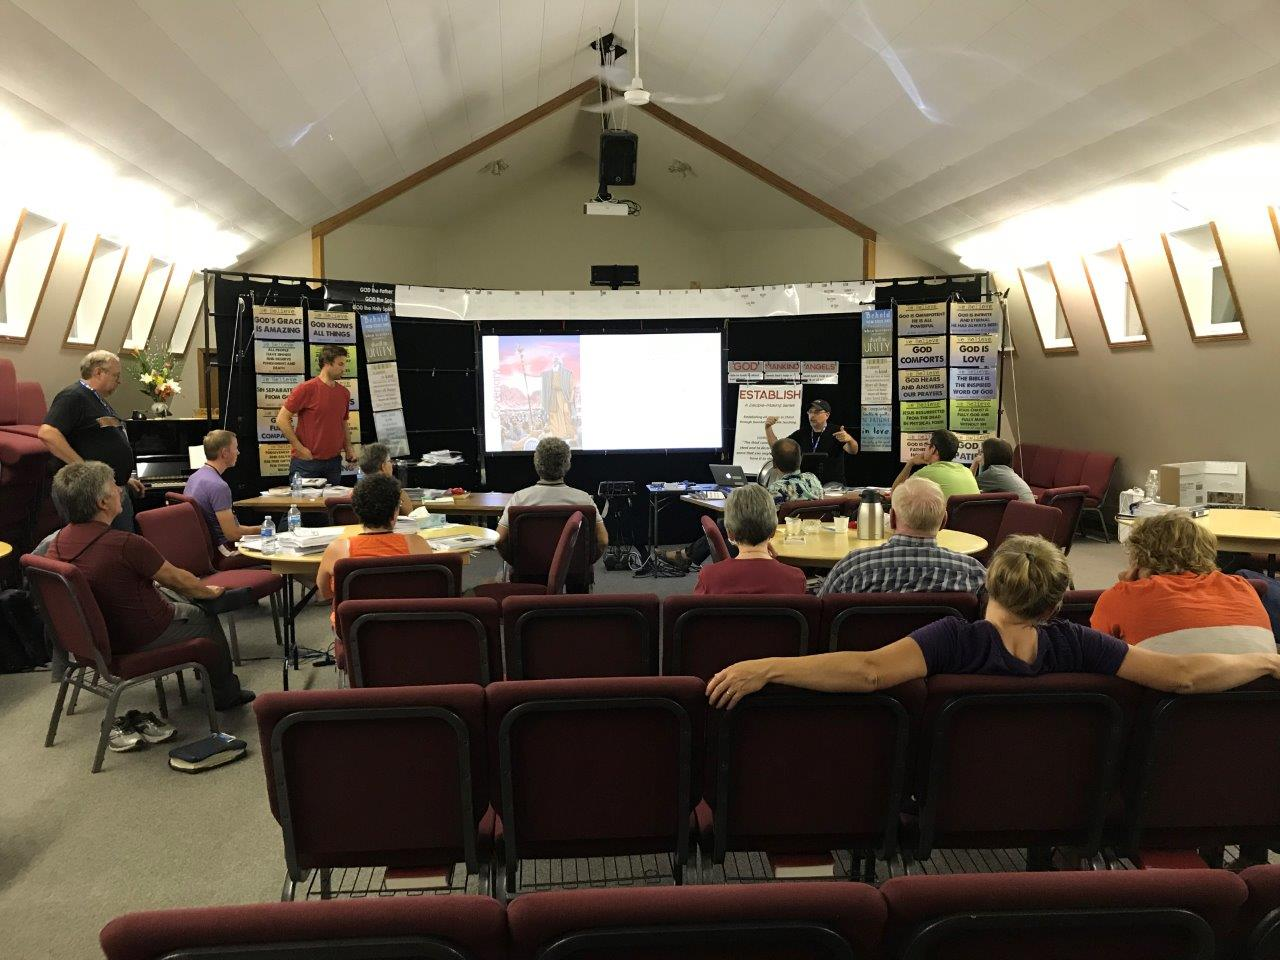 Craig Bauman, Ethnos Canada missionary, teaching at a church